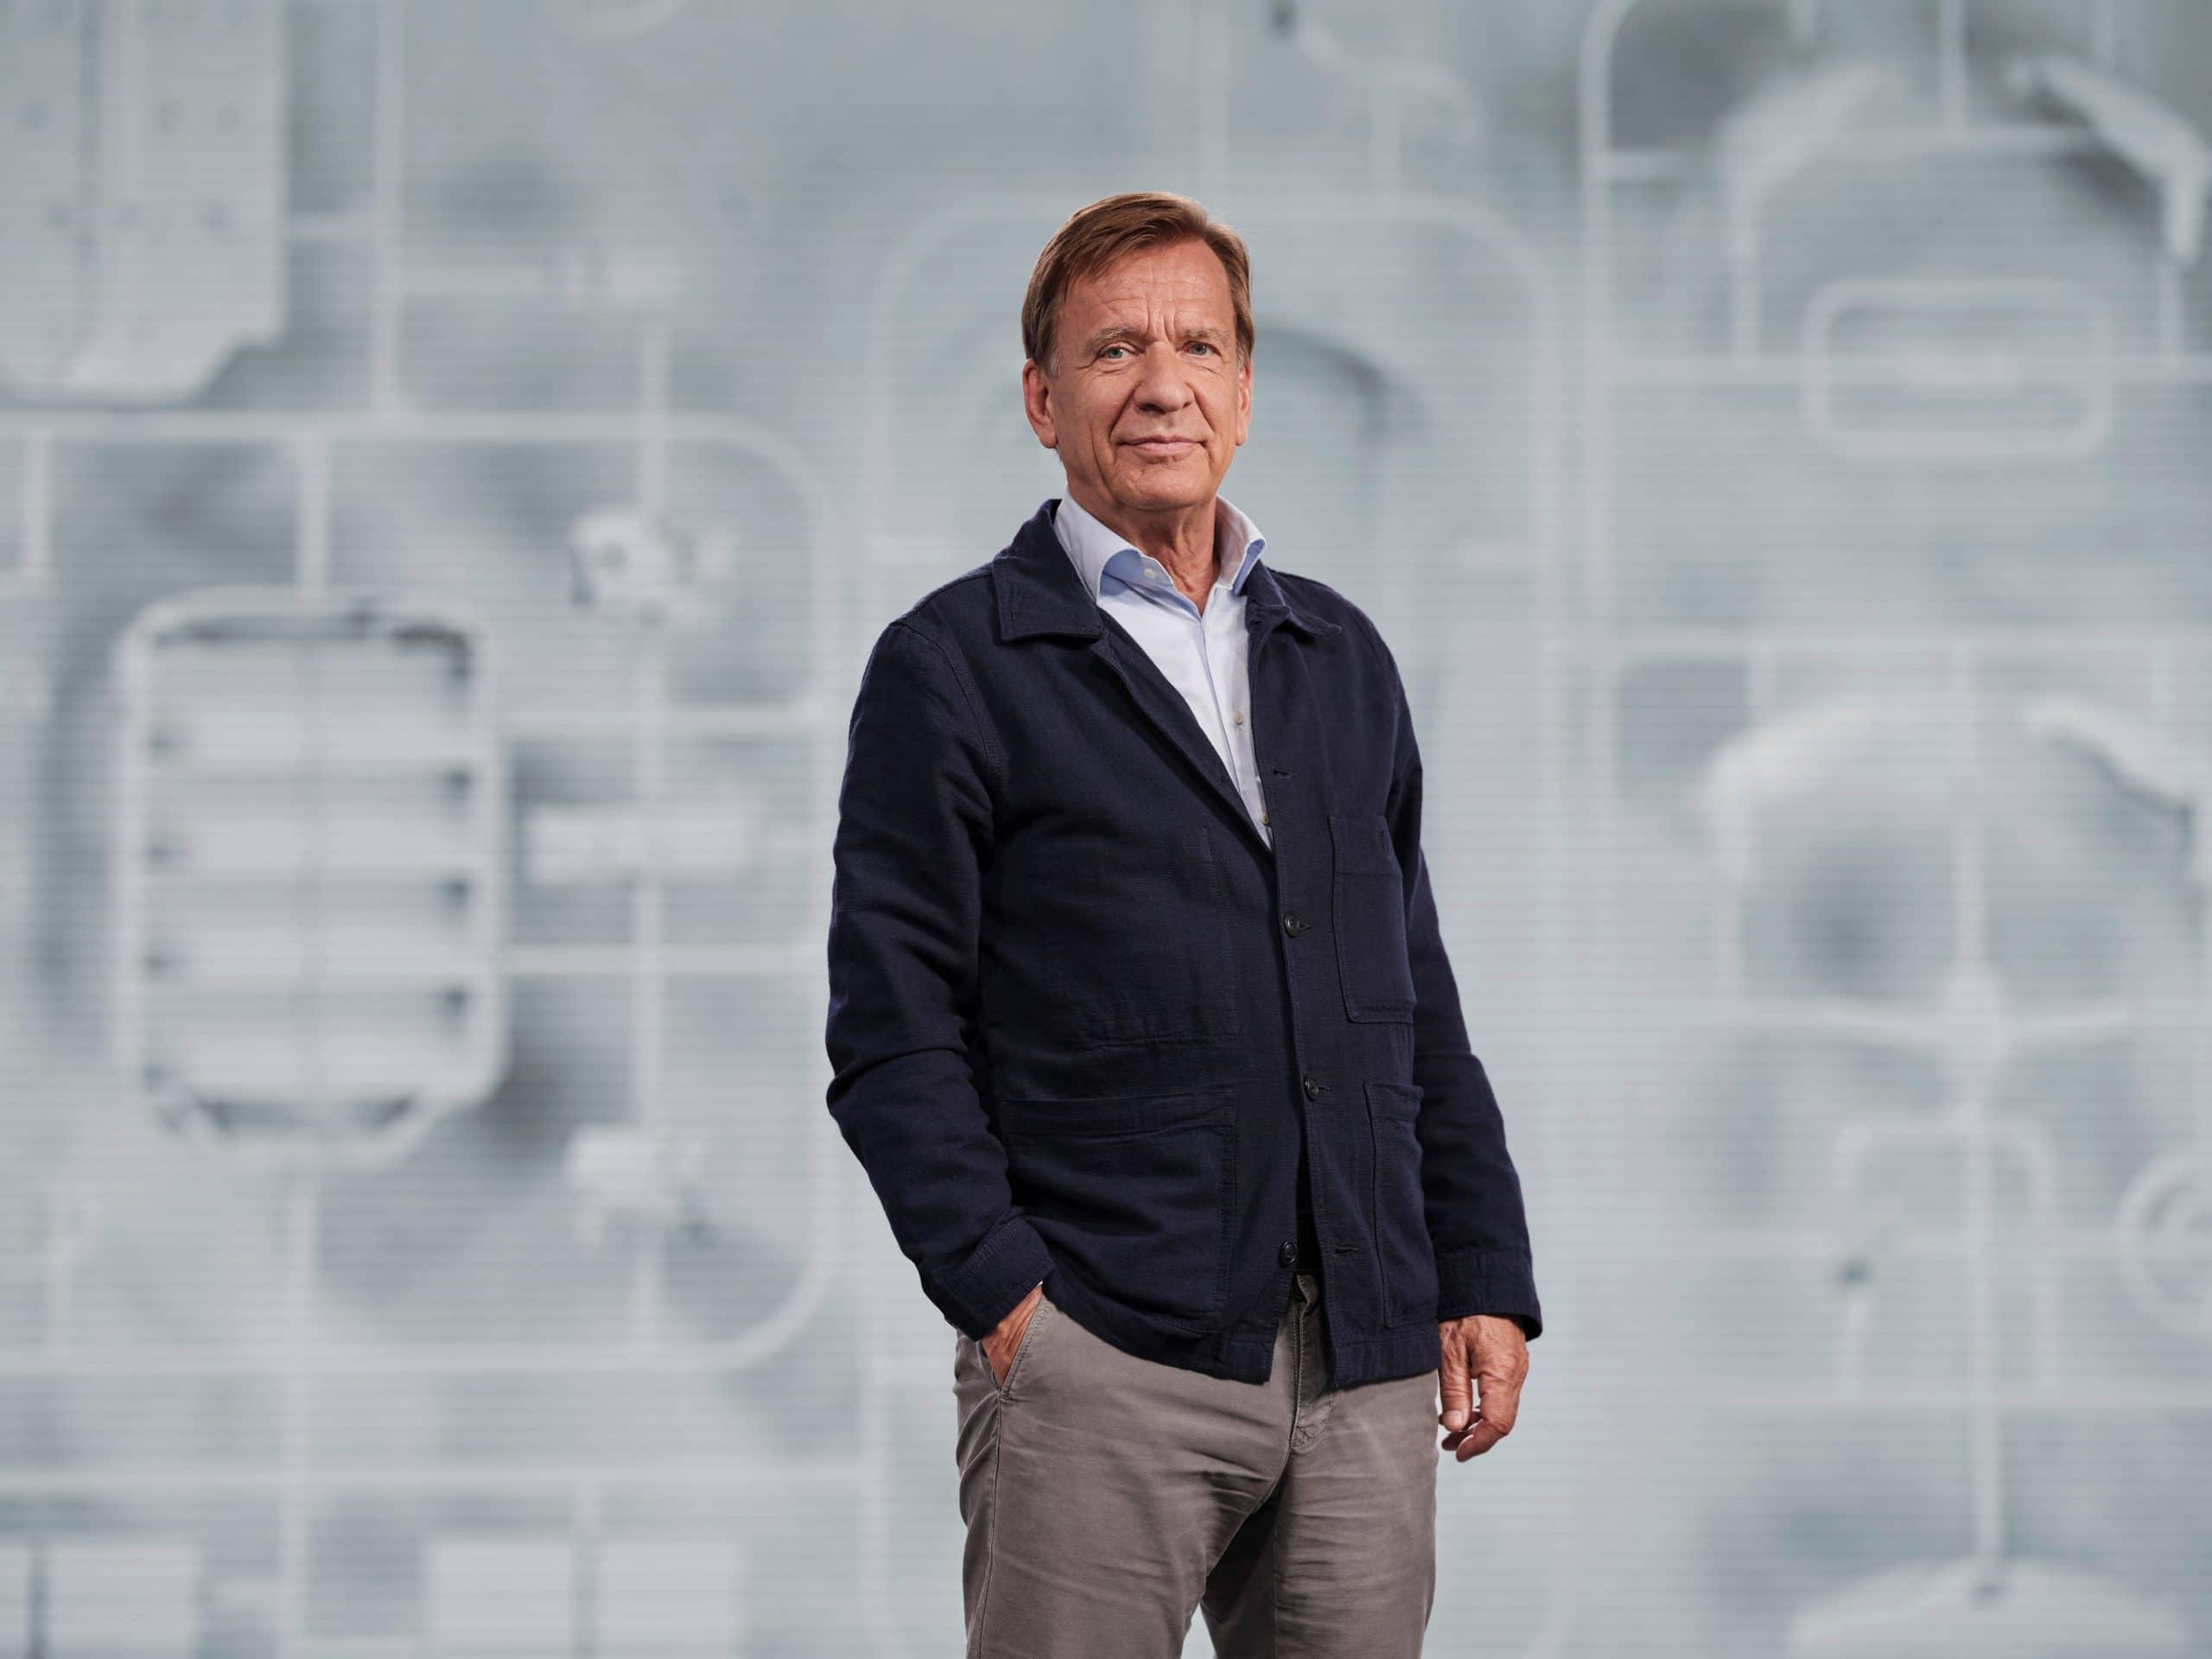 283977 H kan Samuelsson Volvo Cars chief executive scaled Η ECARX επενδύει στη Zenseact της Volvo, για την αυτόνομη οδήγηση Autonomous Driving, ECARX, Polestar, Volvo, Zenseact, ειδήσεις, Νέα, Τεχνολογία